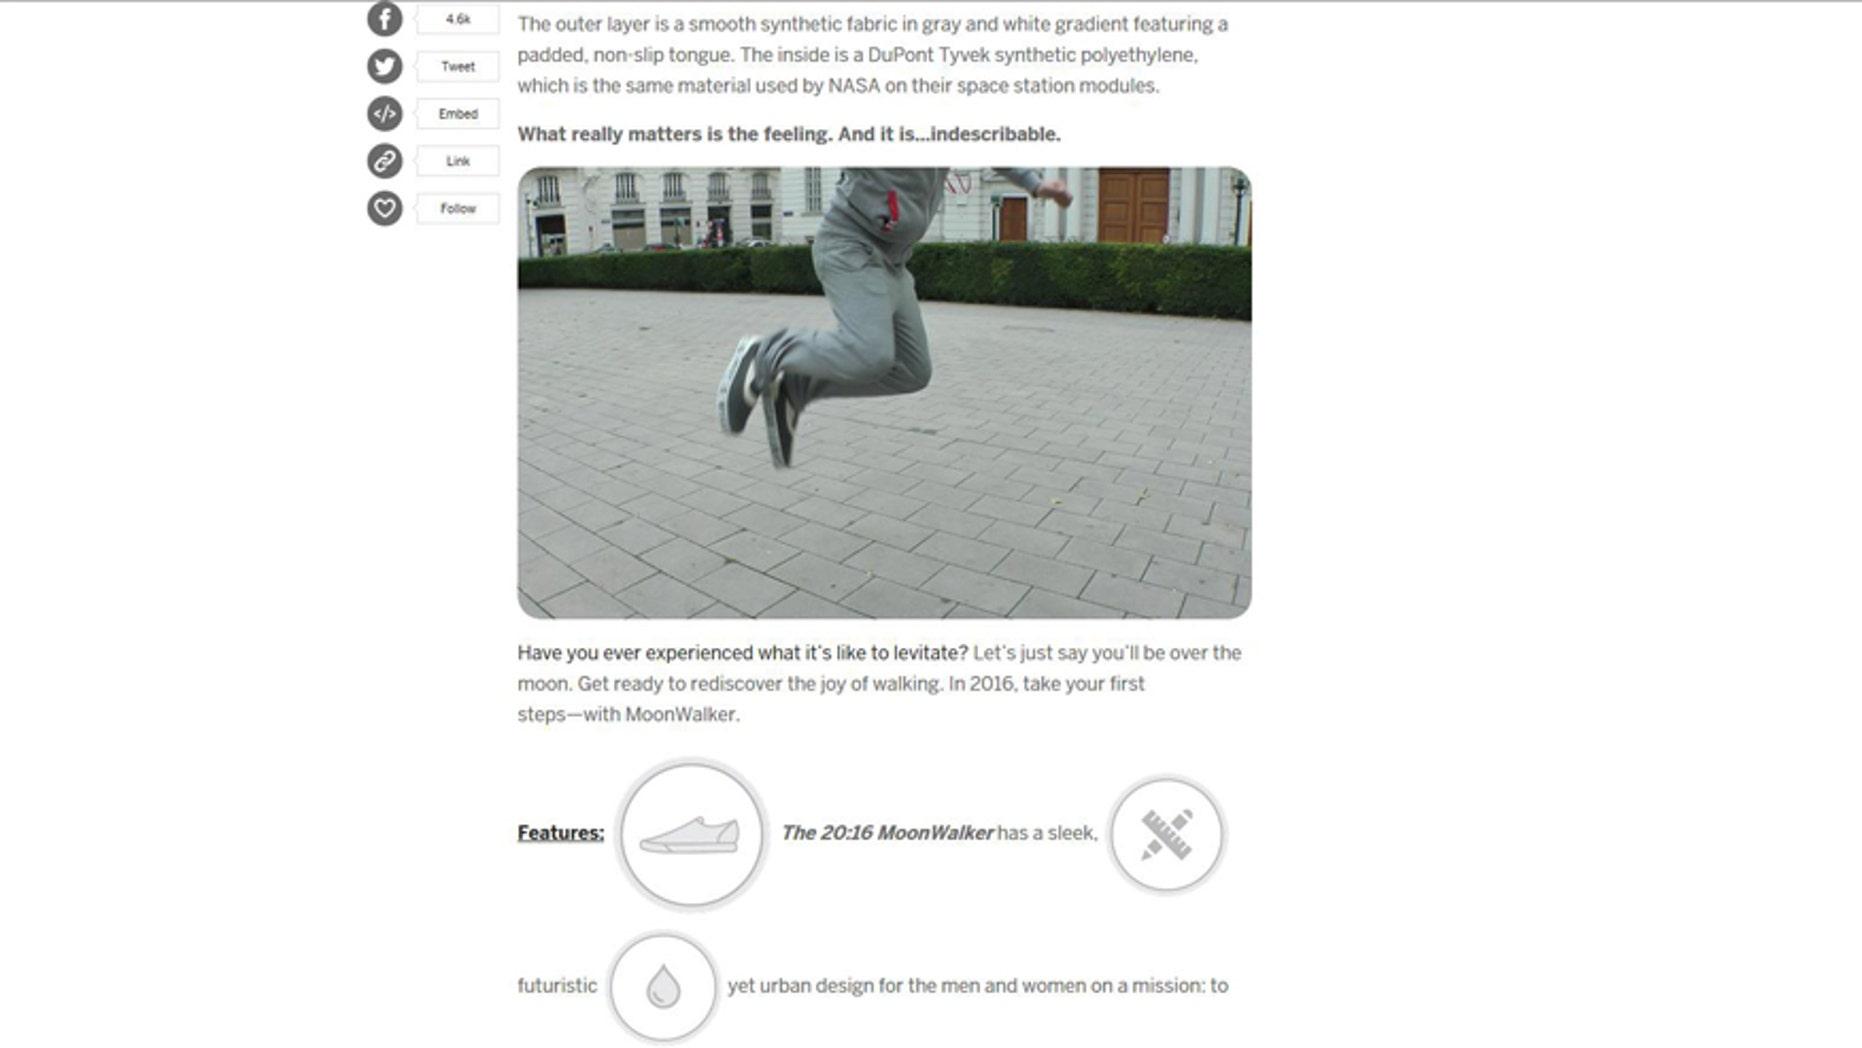 (MoonWalker screenshot from www.indiegogo.com)